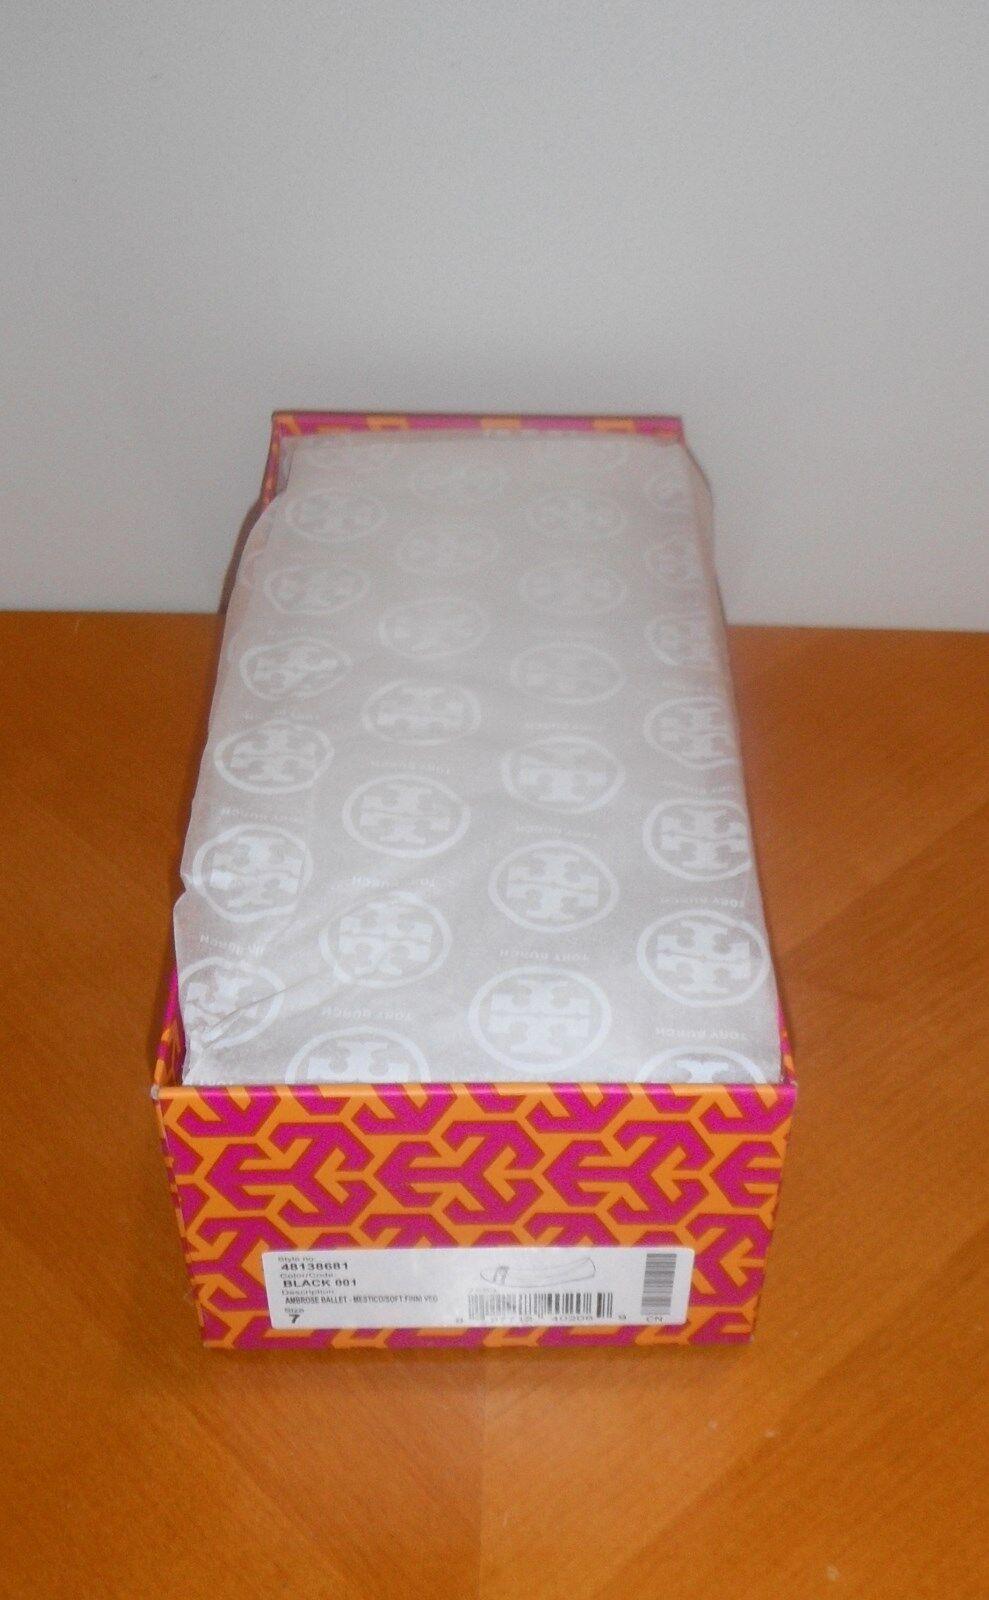 Tory Burch Ambrosa Ballet Flat Flat Flat nero 001 Ballerina BRAND NEW BOX FRESH PAIR 8651ed